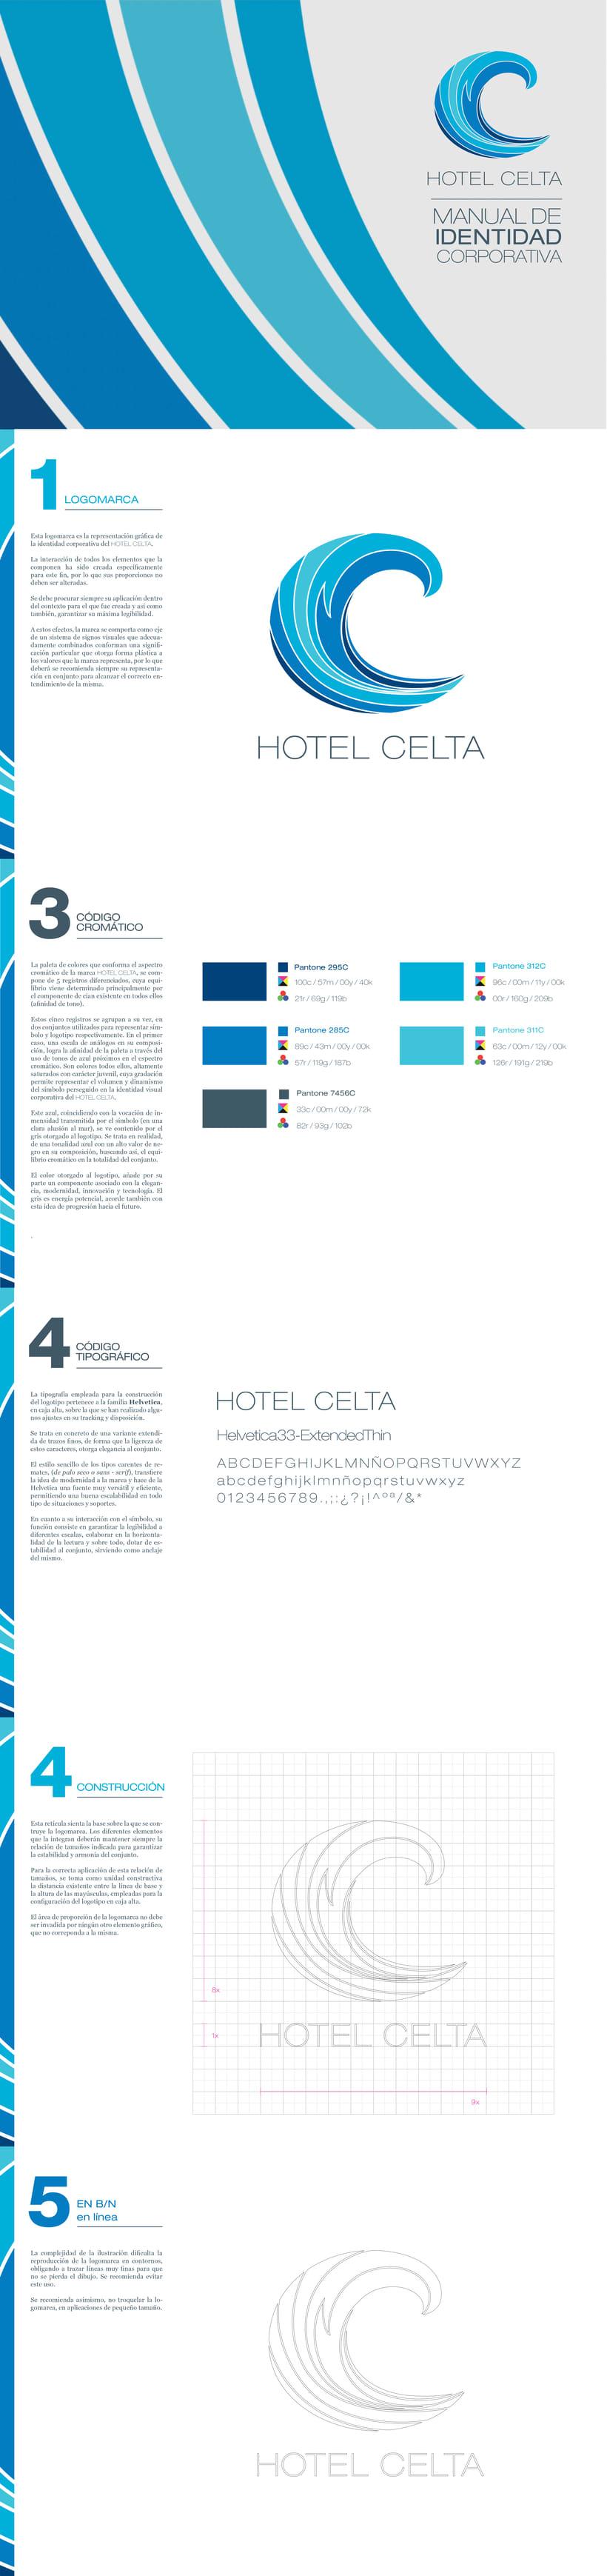 Hotel Celta -1